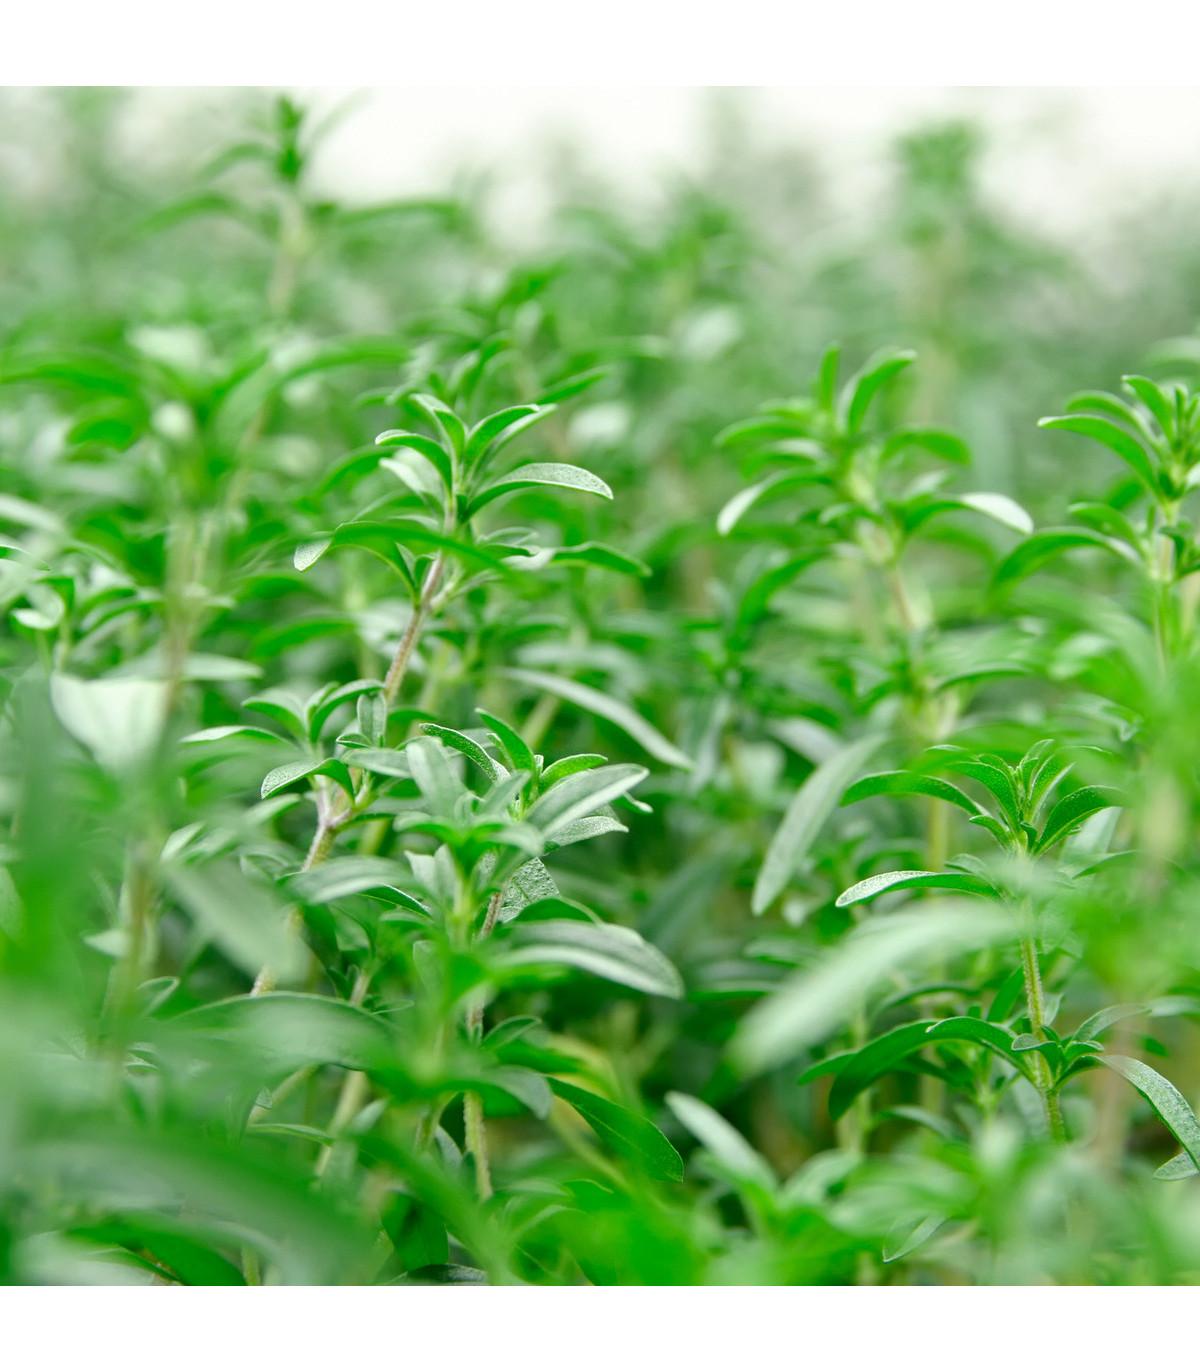 BIO osivá Saturejka záhradná - bylinka Satureja hortensis - bio semienka Saturejky - 1 g